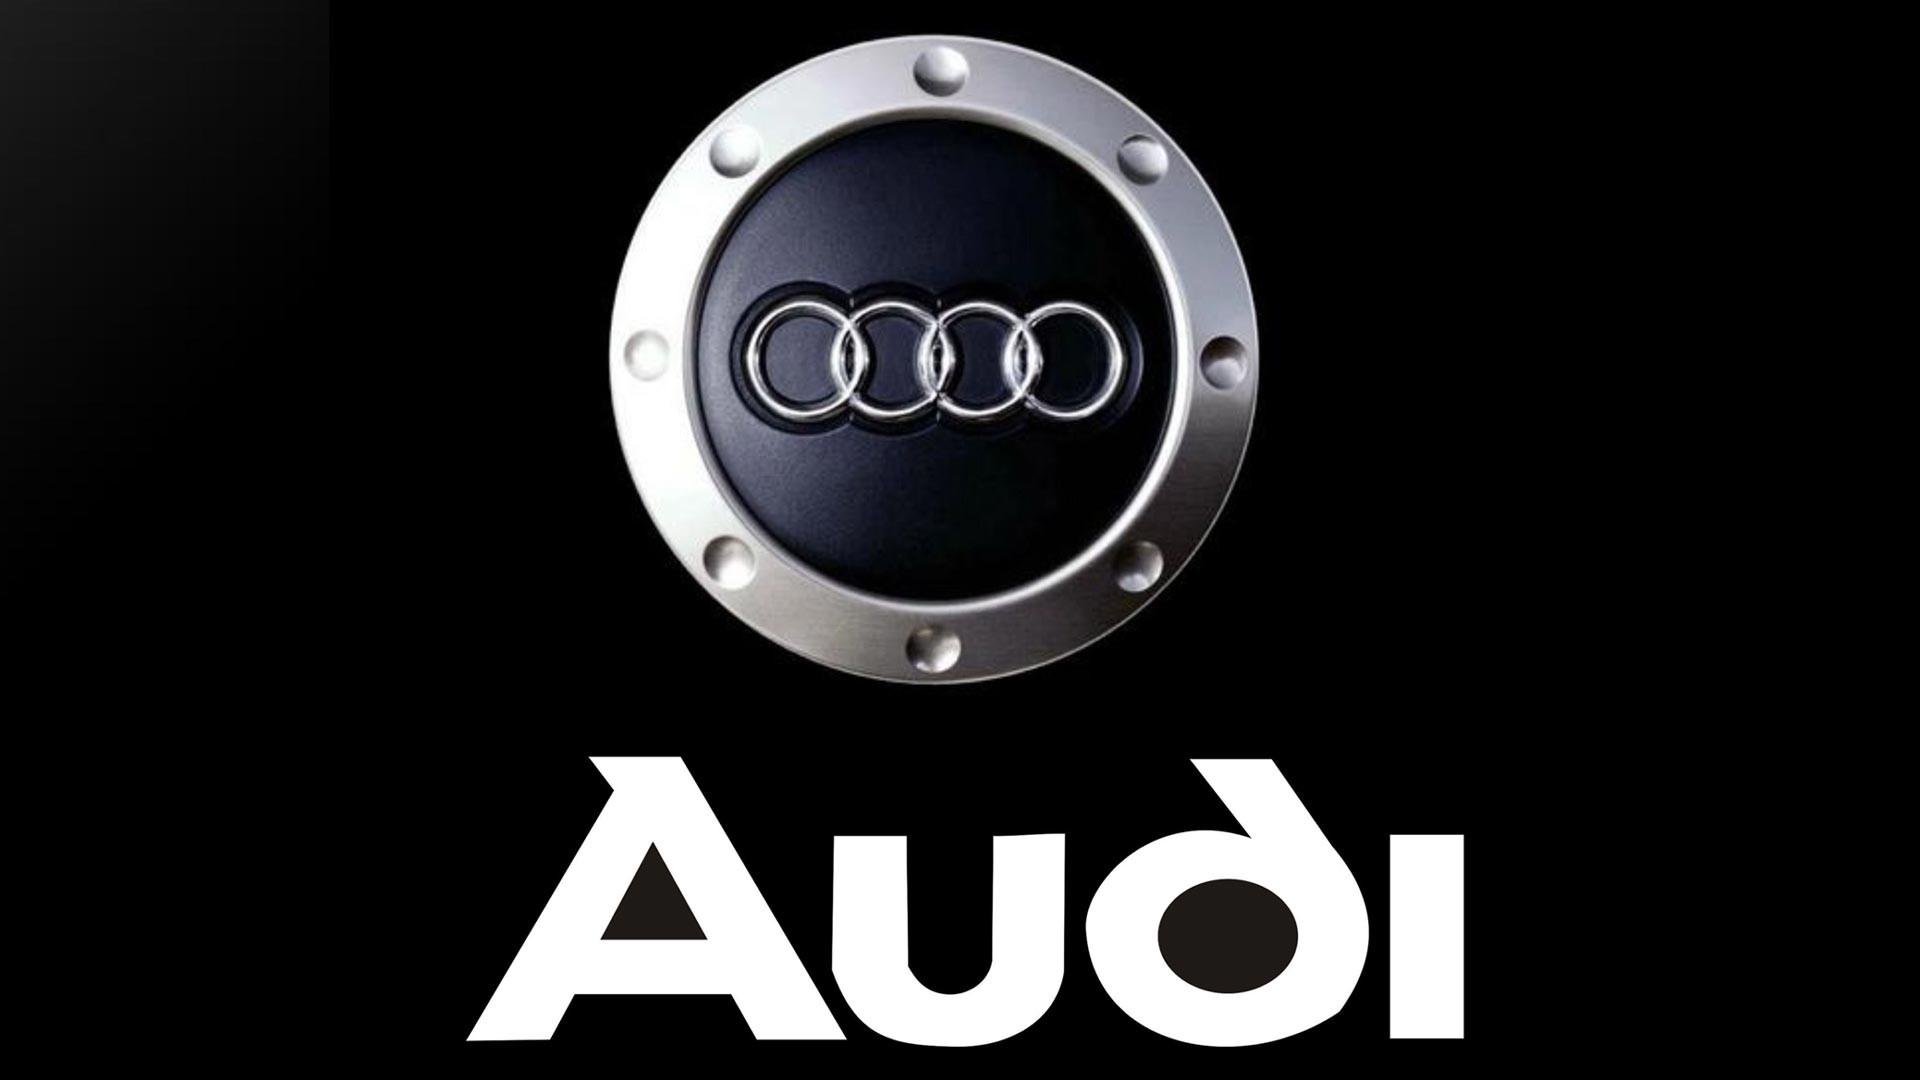 Audi Logo Full HD Wallpaper 1920×1080